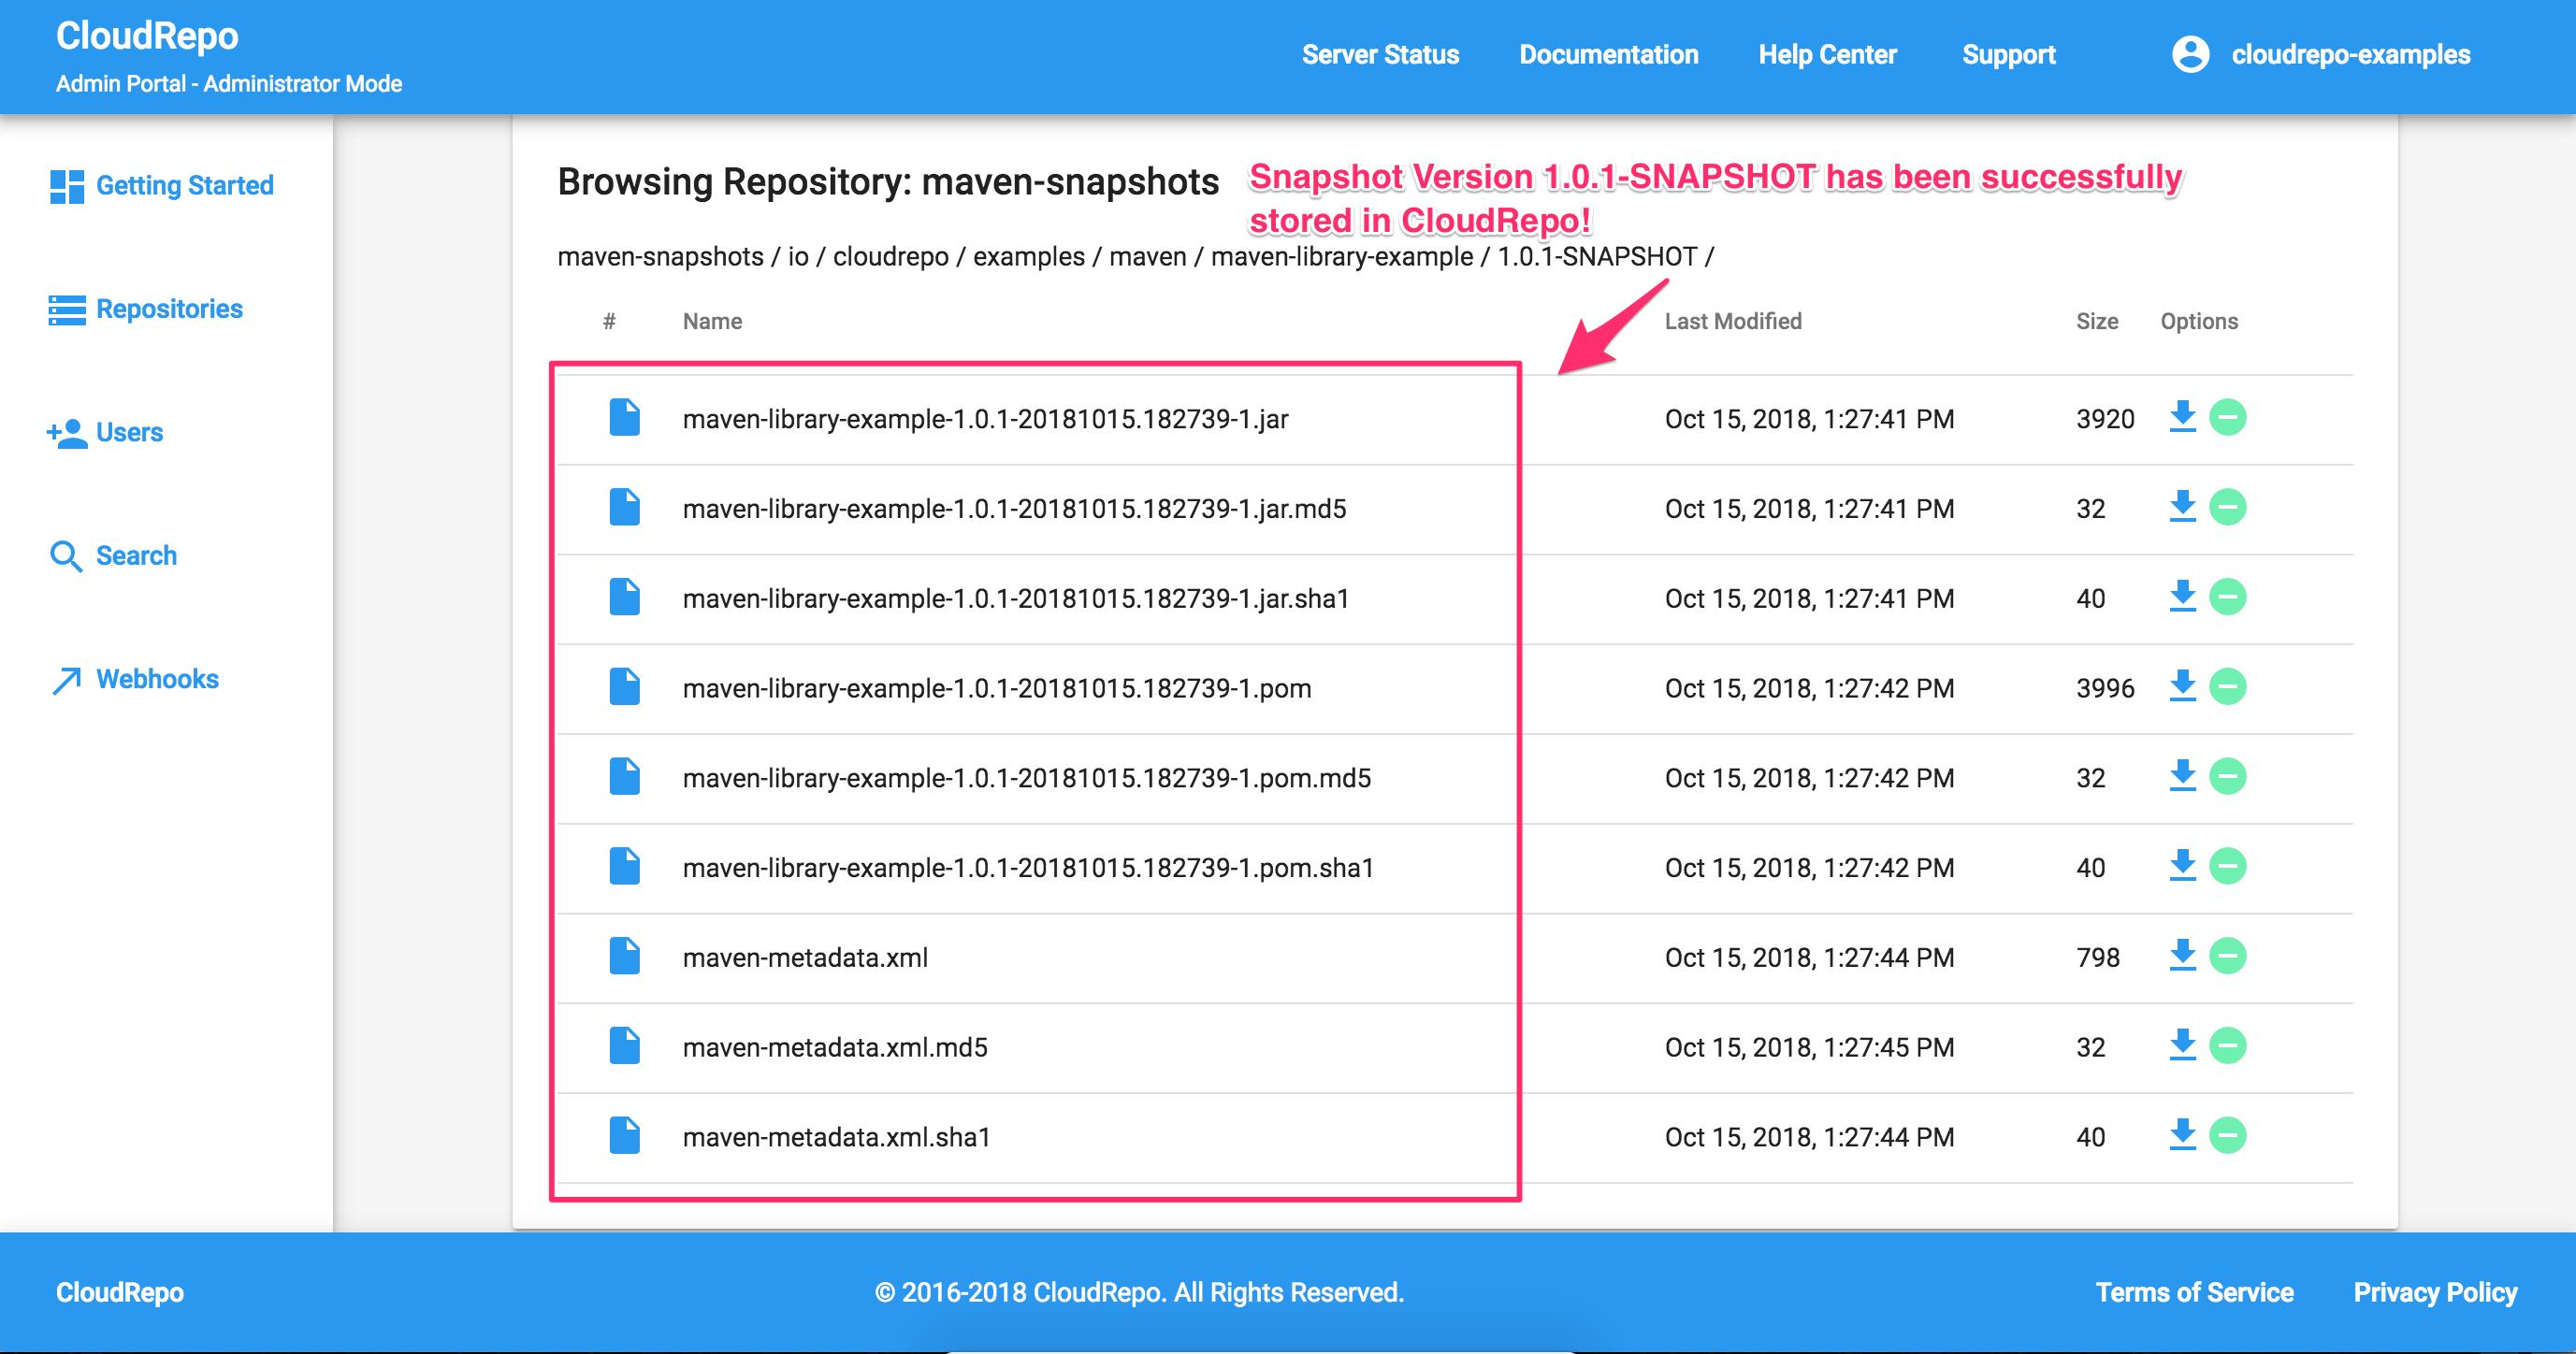 CloudRepo Snapshot Release